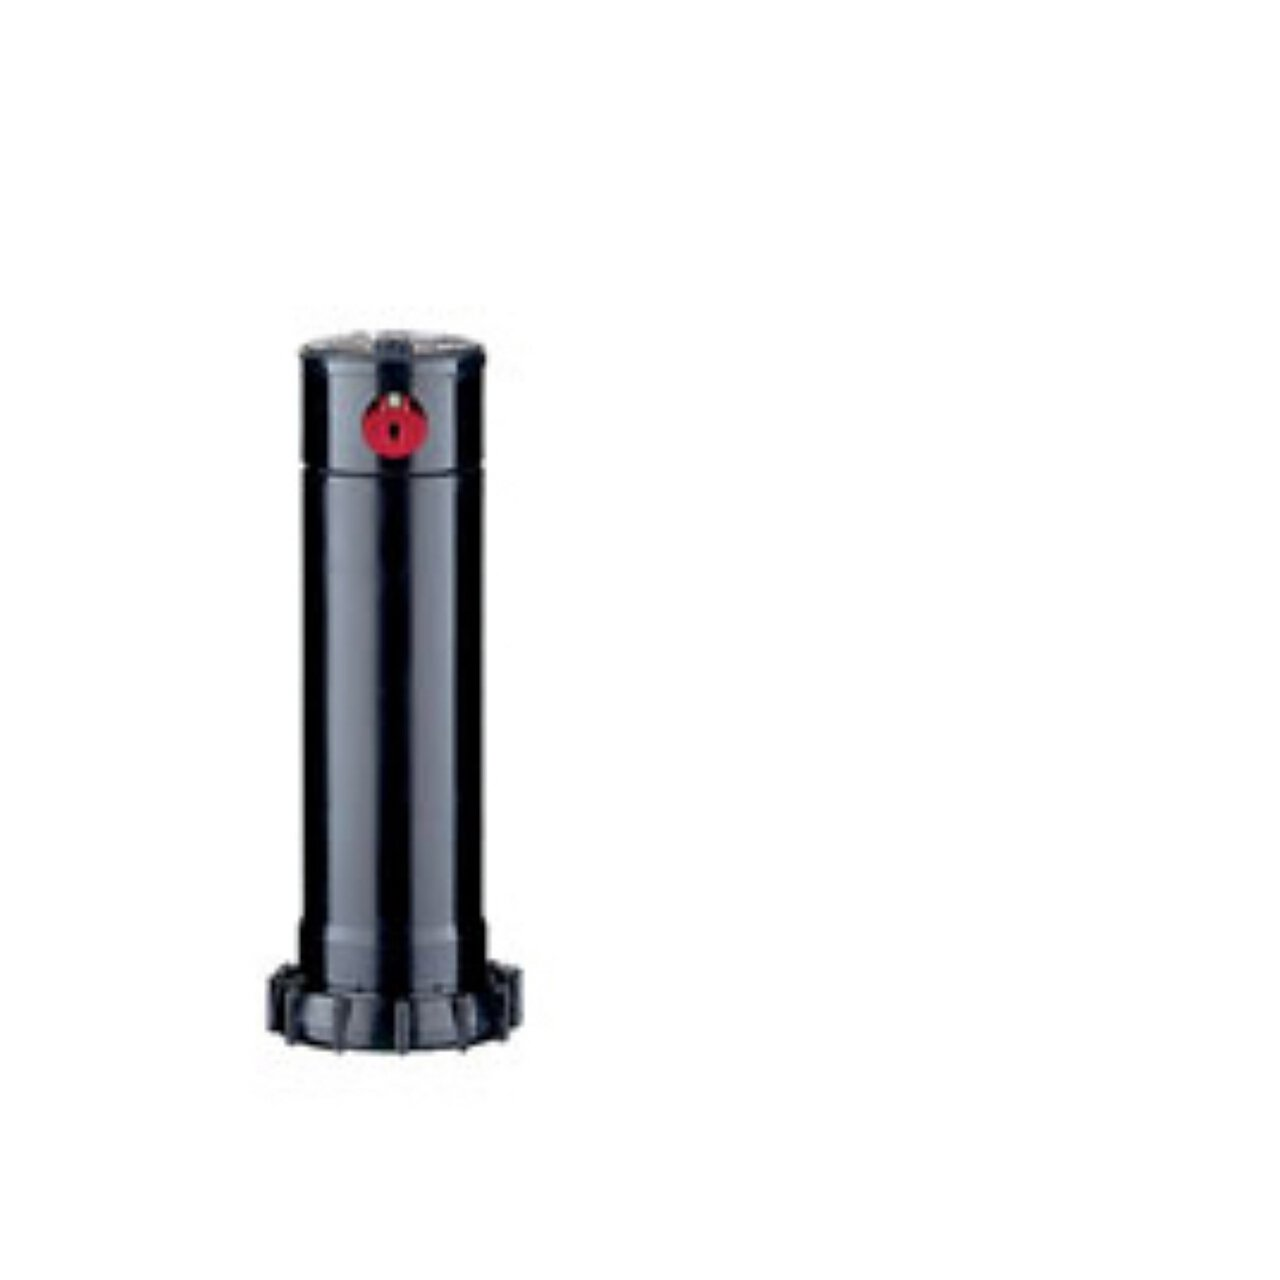 Hunter Sprinkler PGJ00 PGJ Series Shrub Rotor Sprinklers with Adjustable Arc